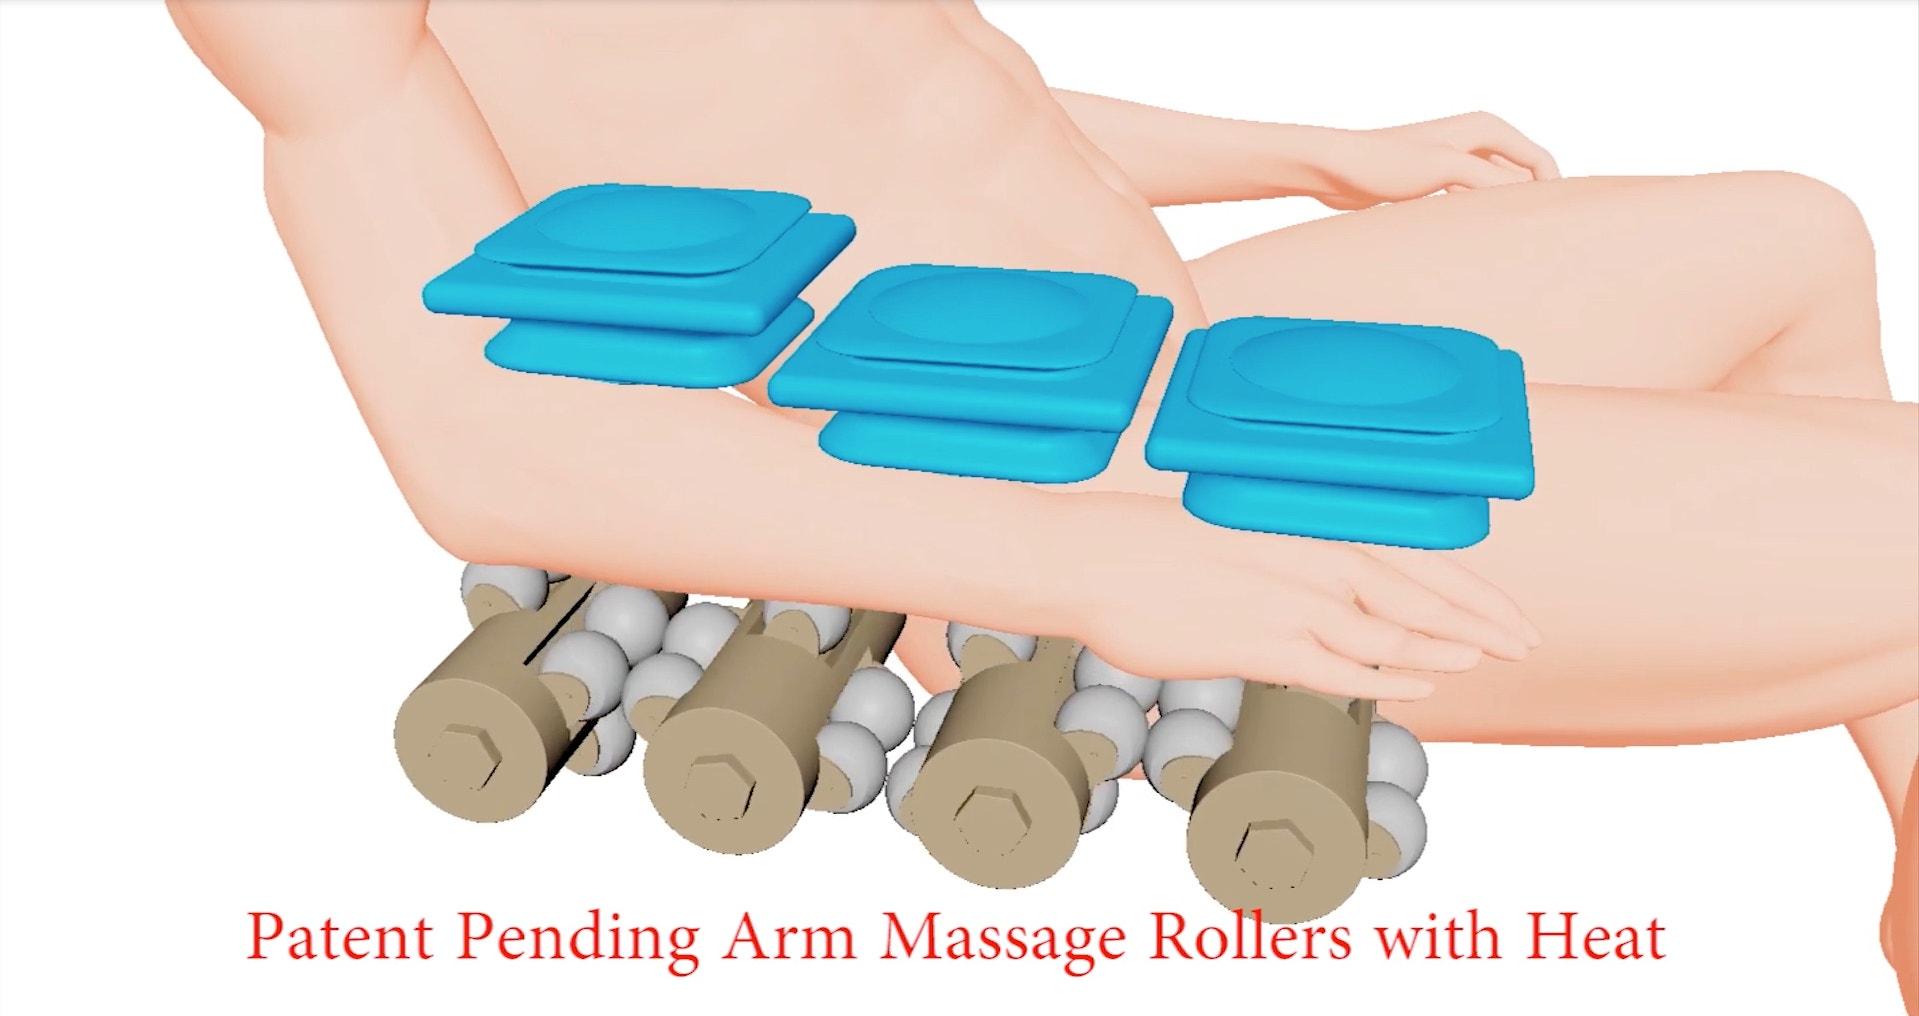 Luraco i9 Arm Massage